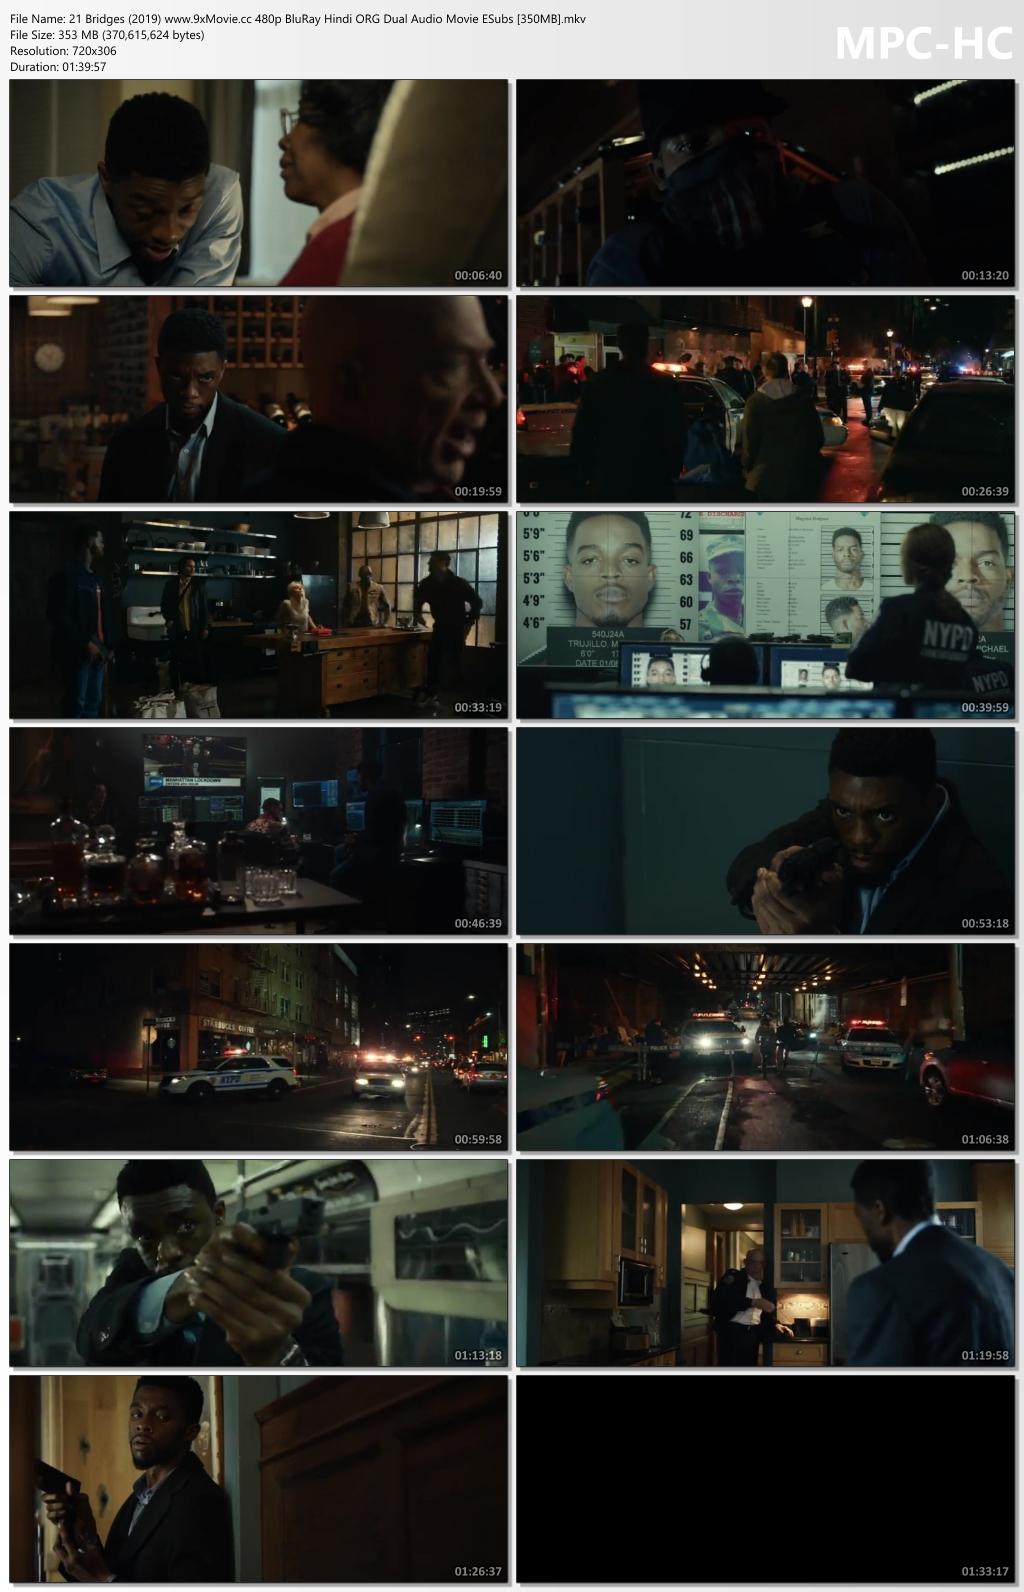 21-Bridges-2019-www-9x-Movie-cc-480p-Blu-Ray-Hindi-ORG-Dual-Audio-Movie-ESubs-350-MB-mkv